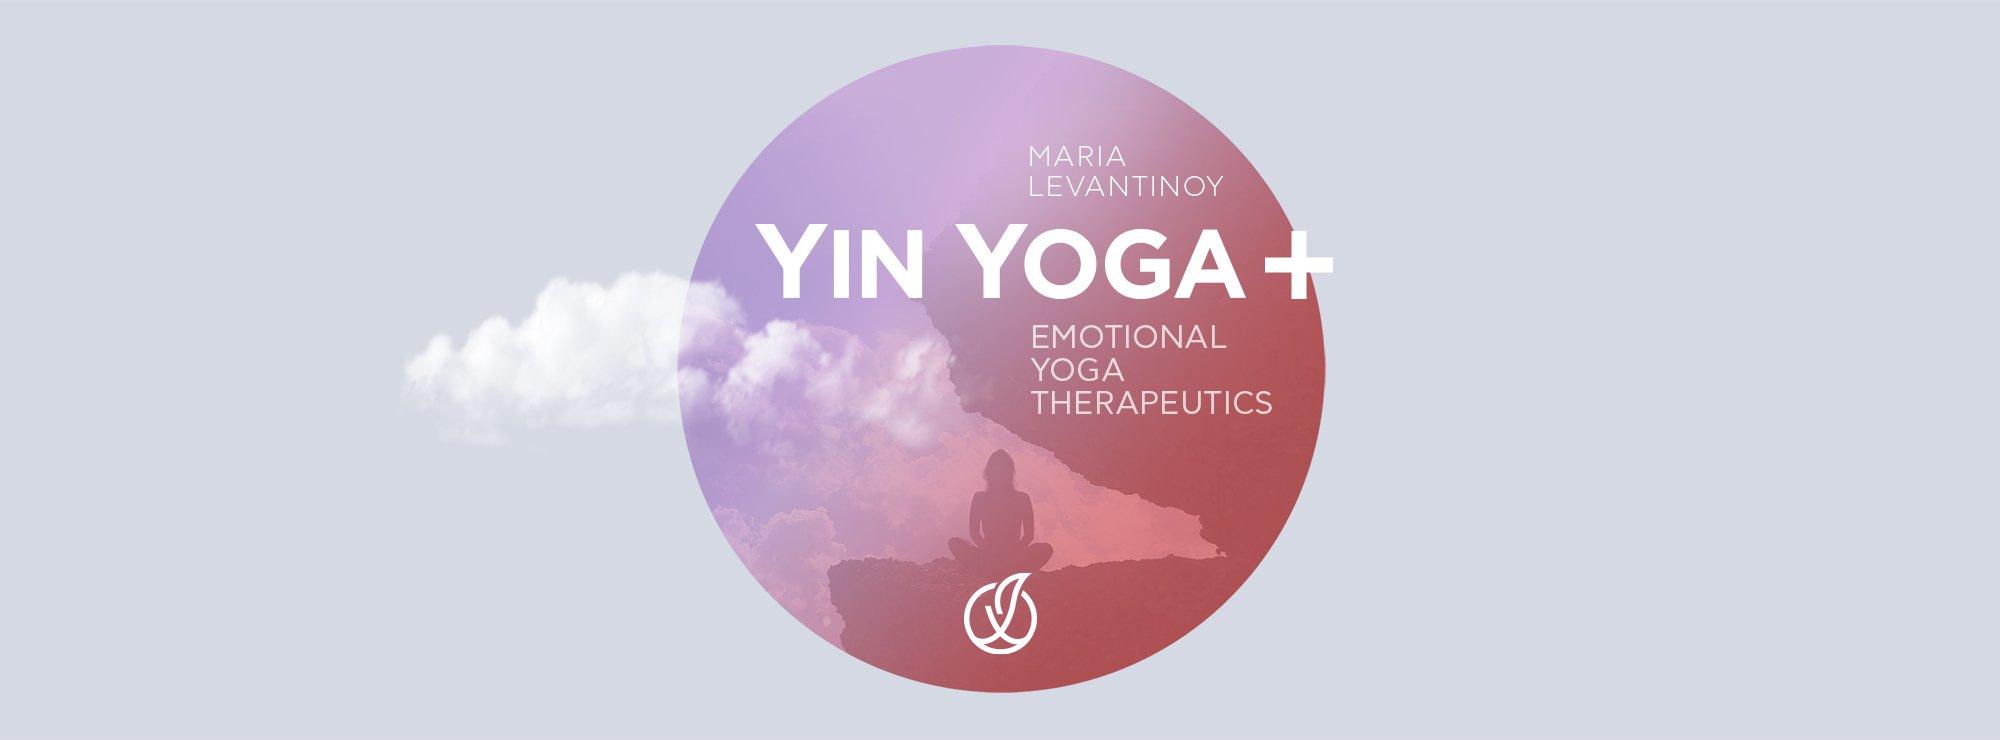 Yin Yoga Maria Levantinou